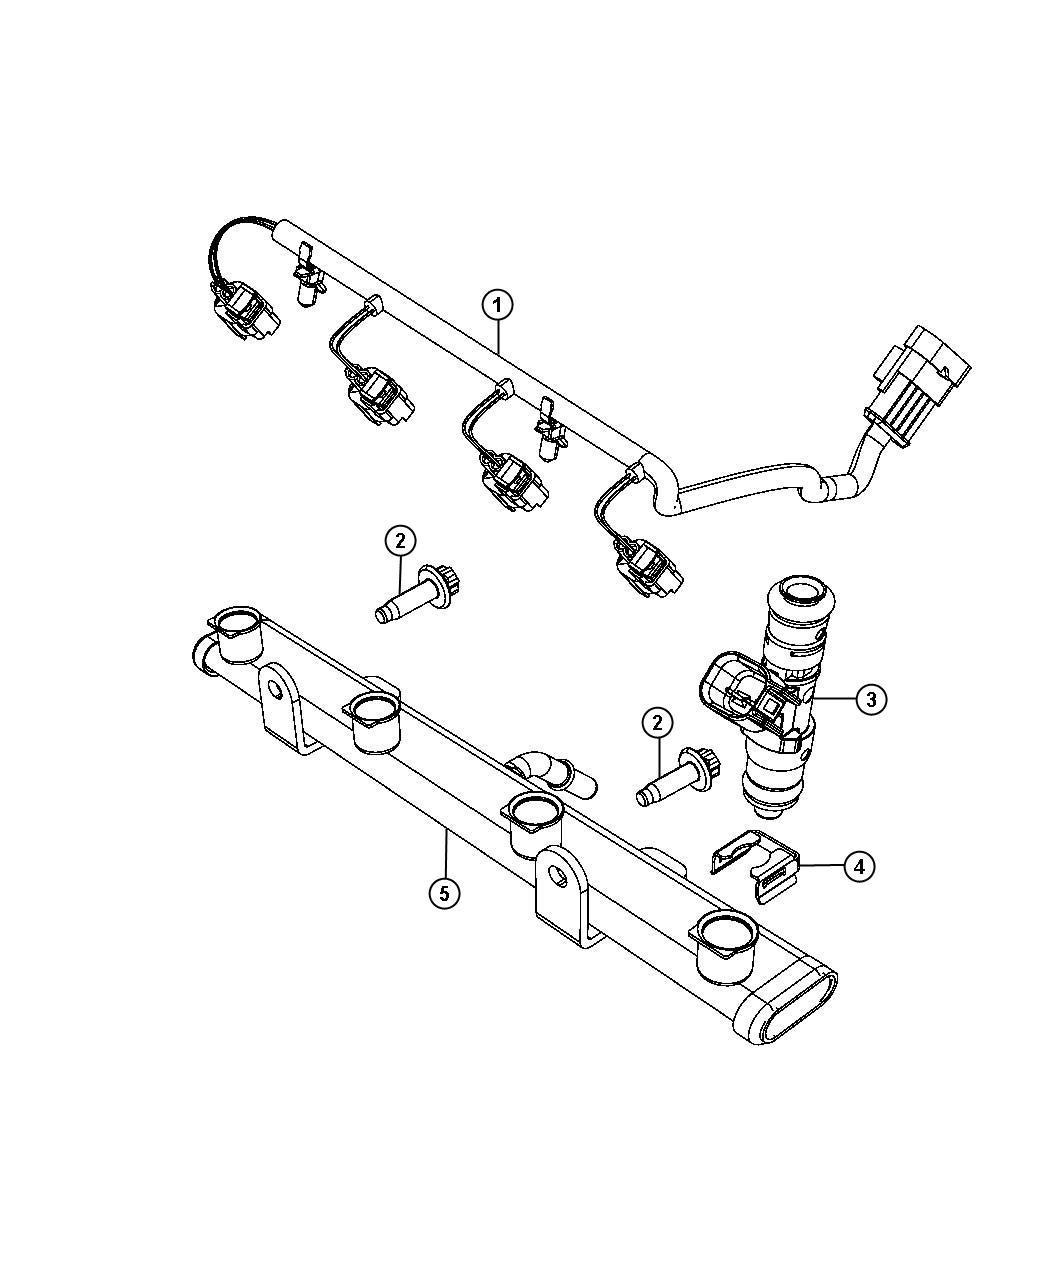 Dodge Dart Wiring. Fuel rail, injector. Injectors